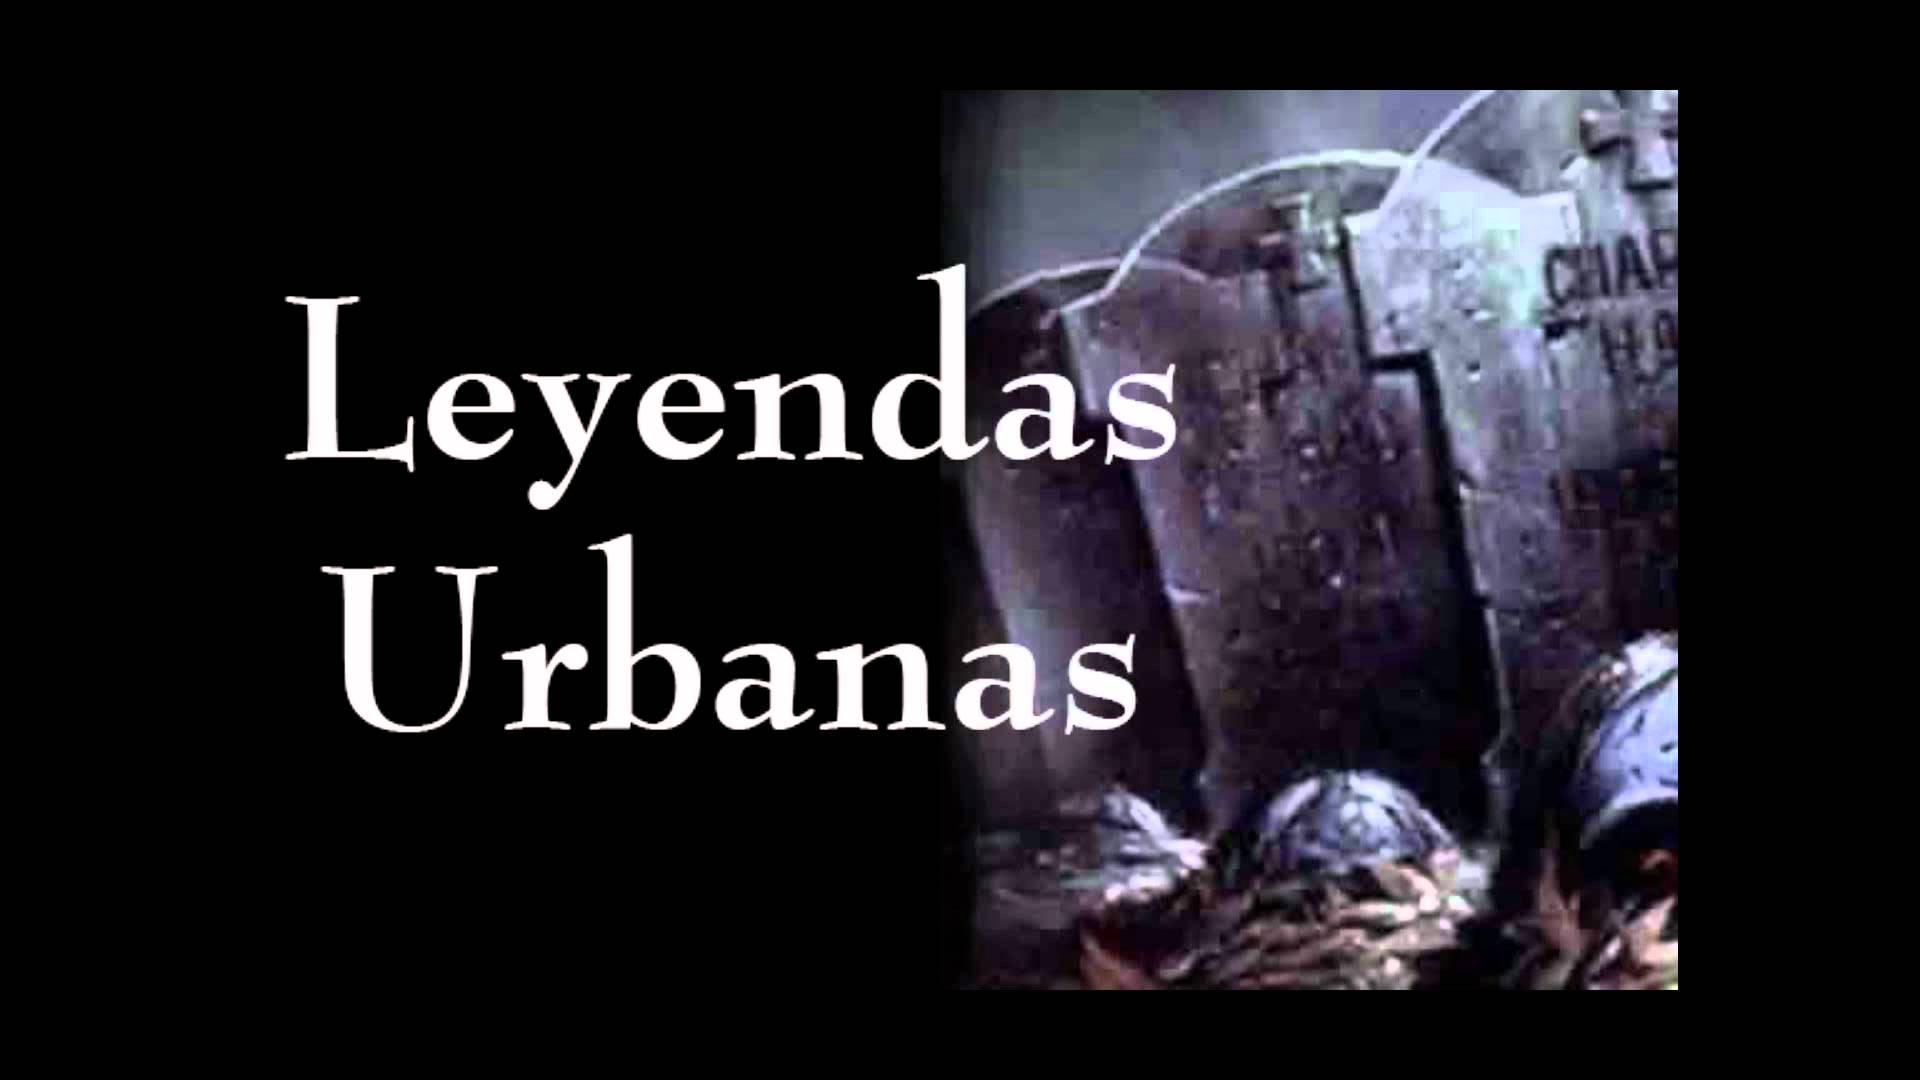 leyendas urbanas